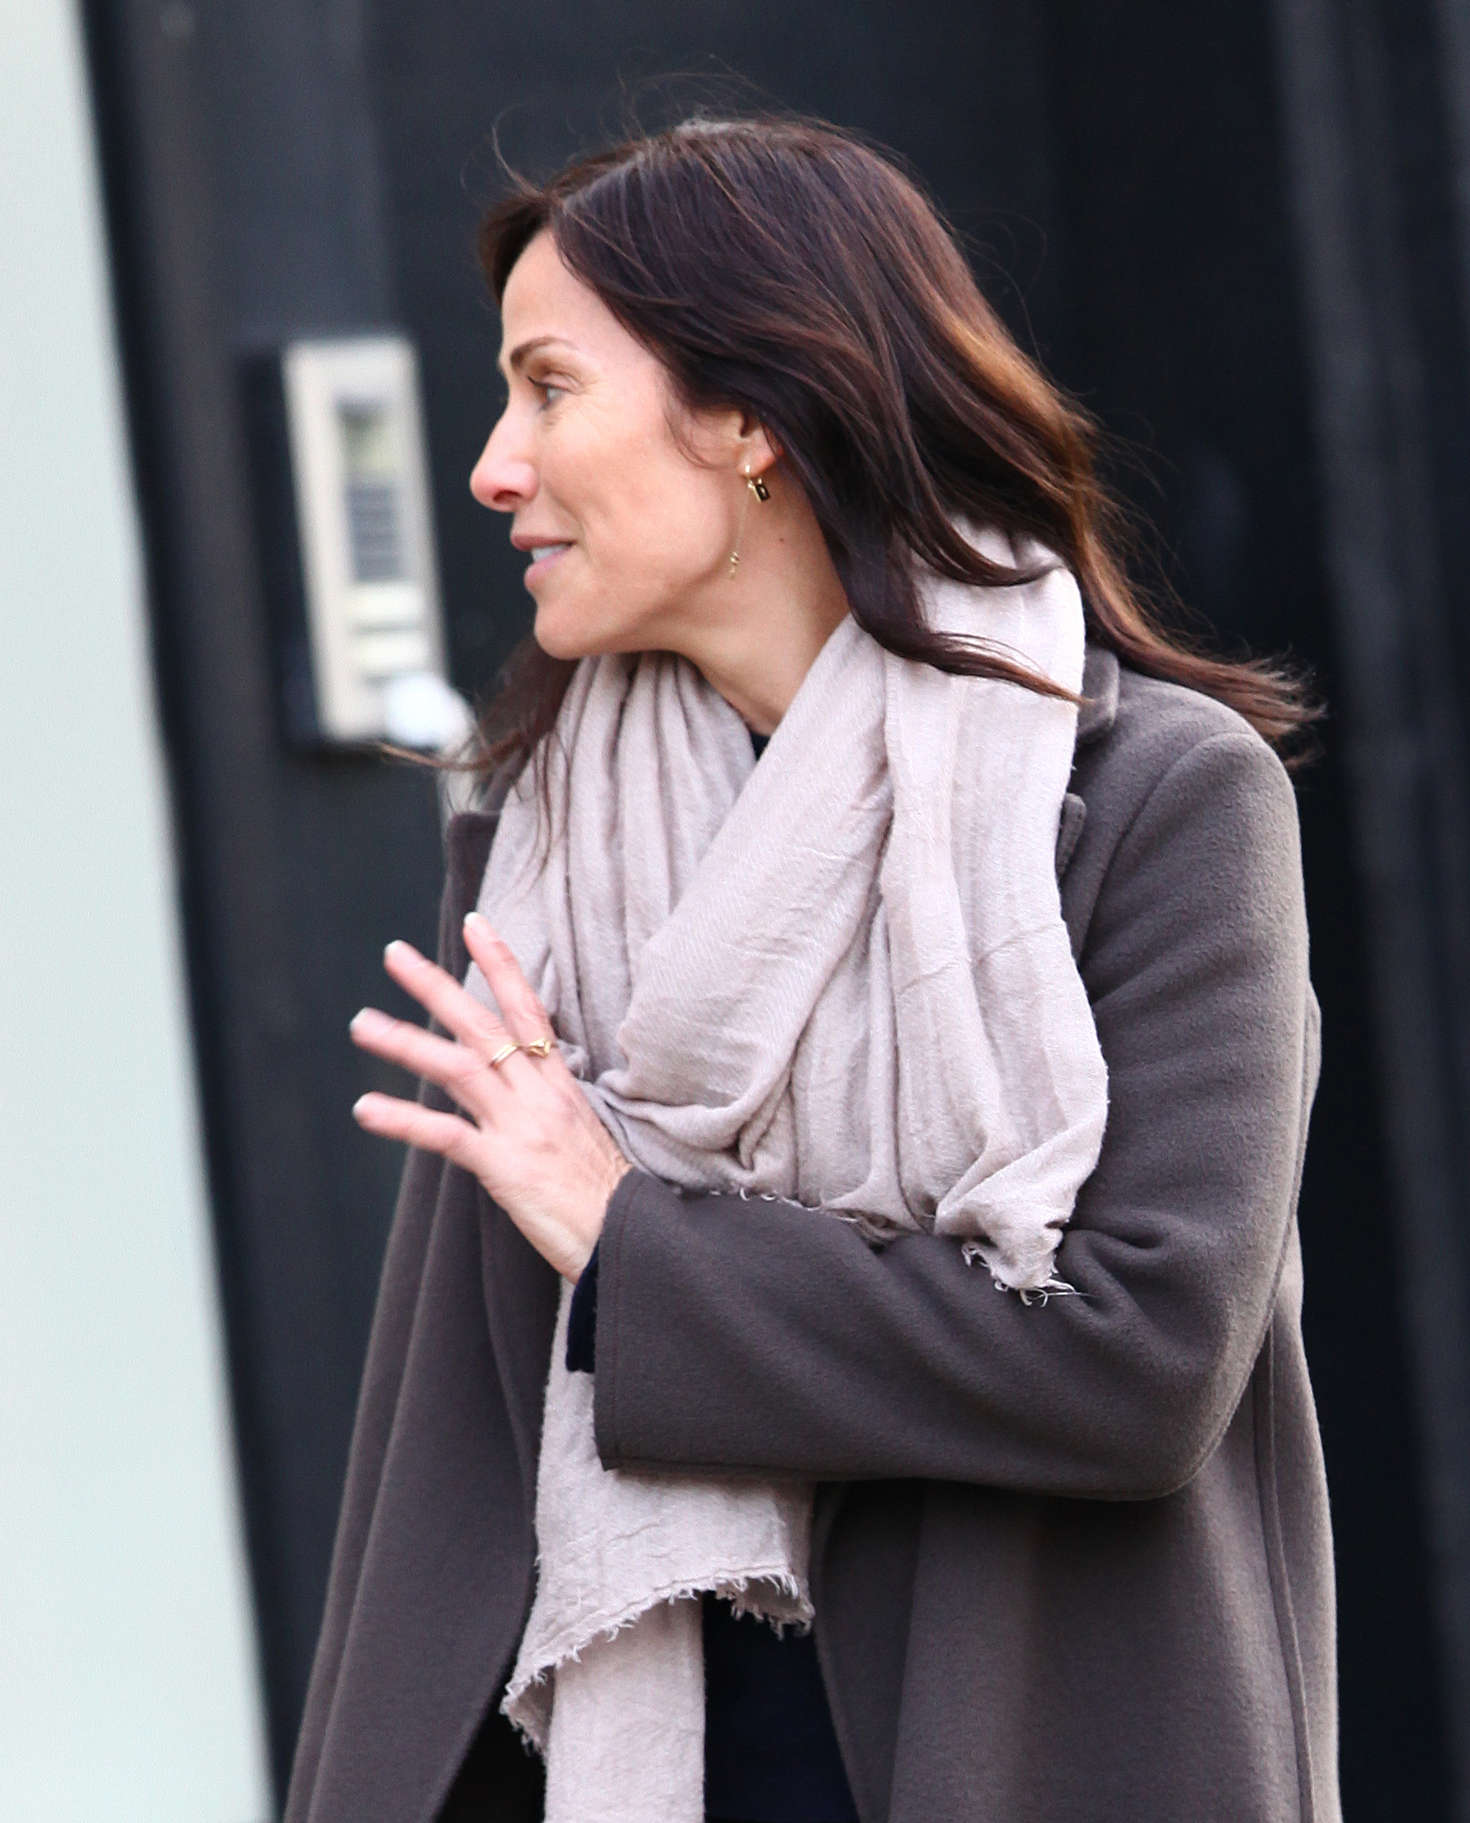 Natalie Imbruglia Walking her Dog in London